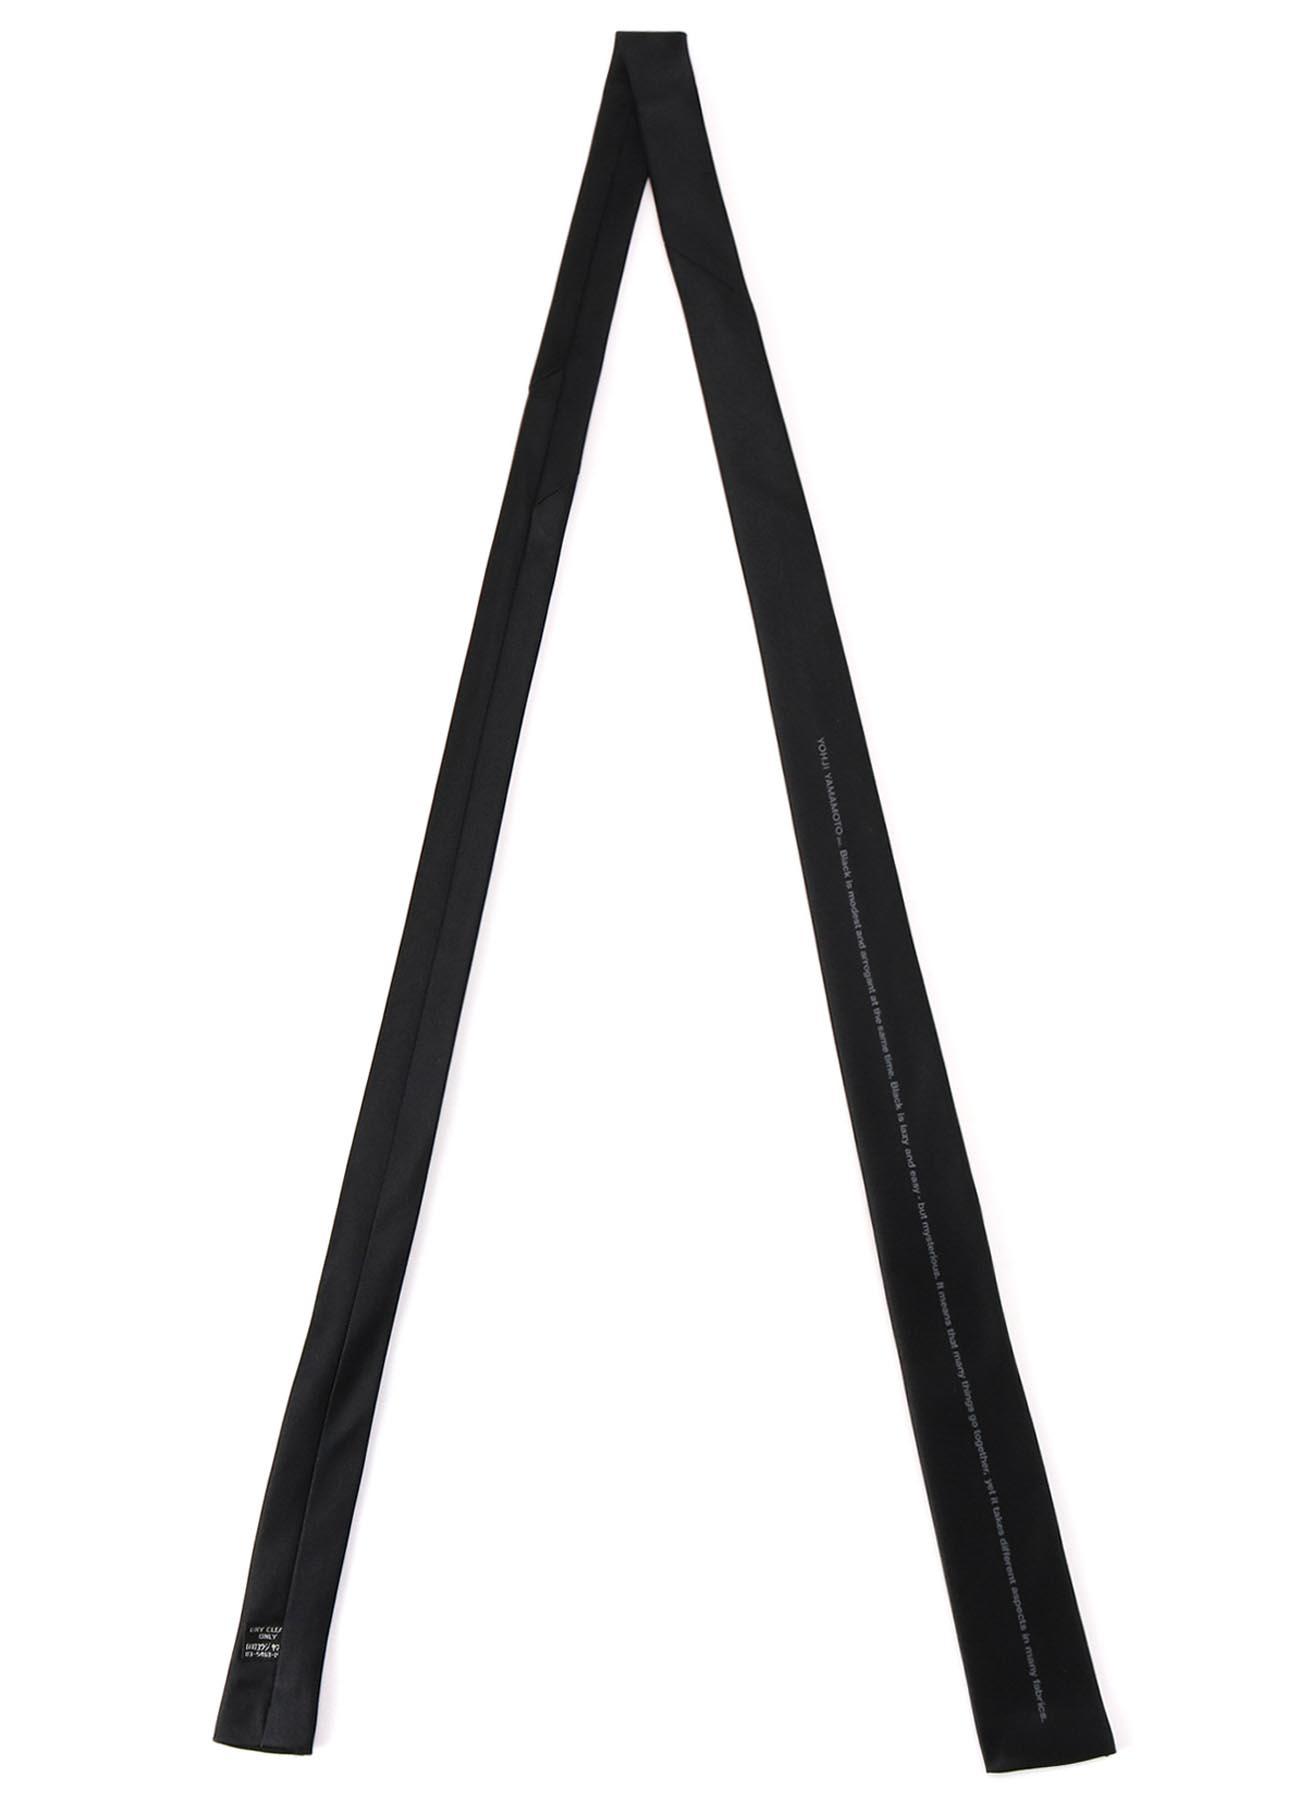 Silk Satin「Black Is Modest」Message Narrow Square Tie